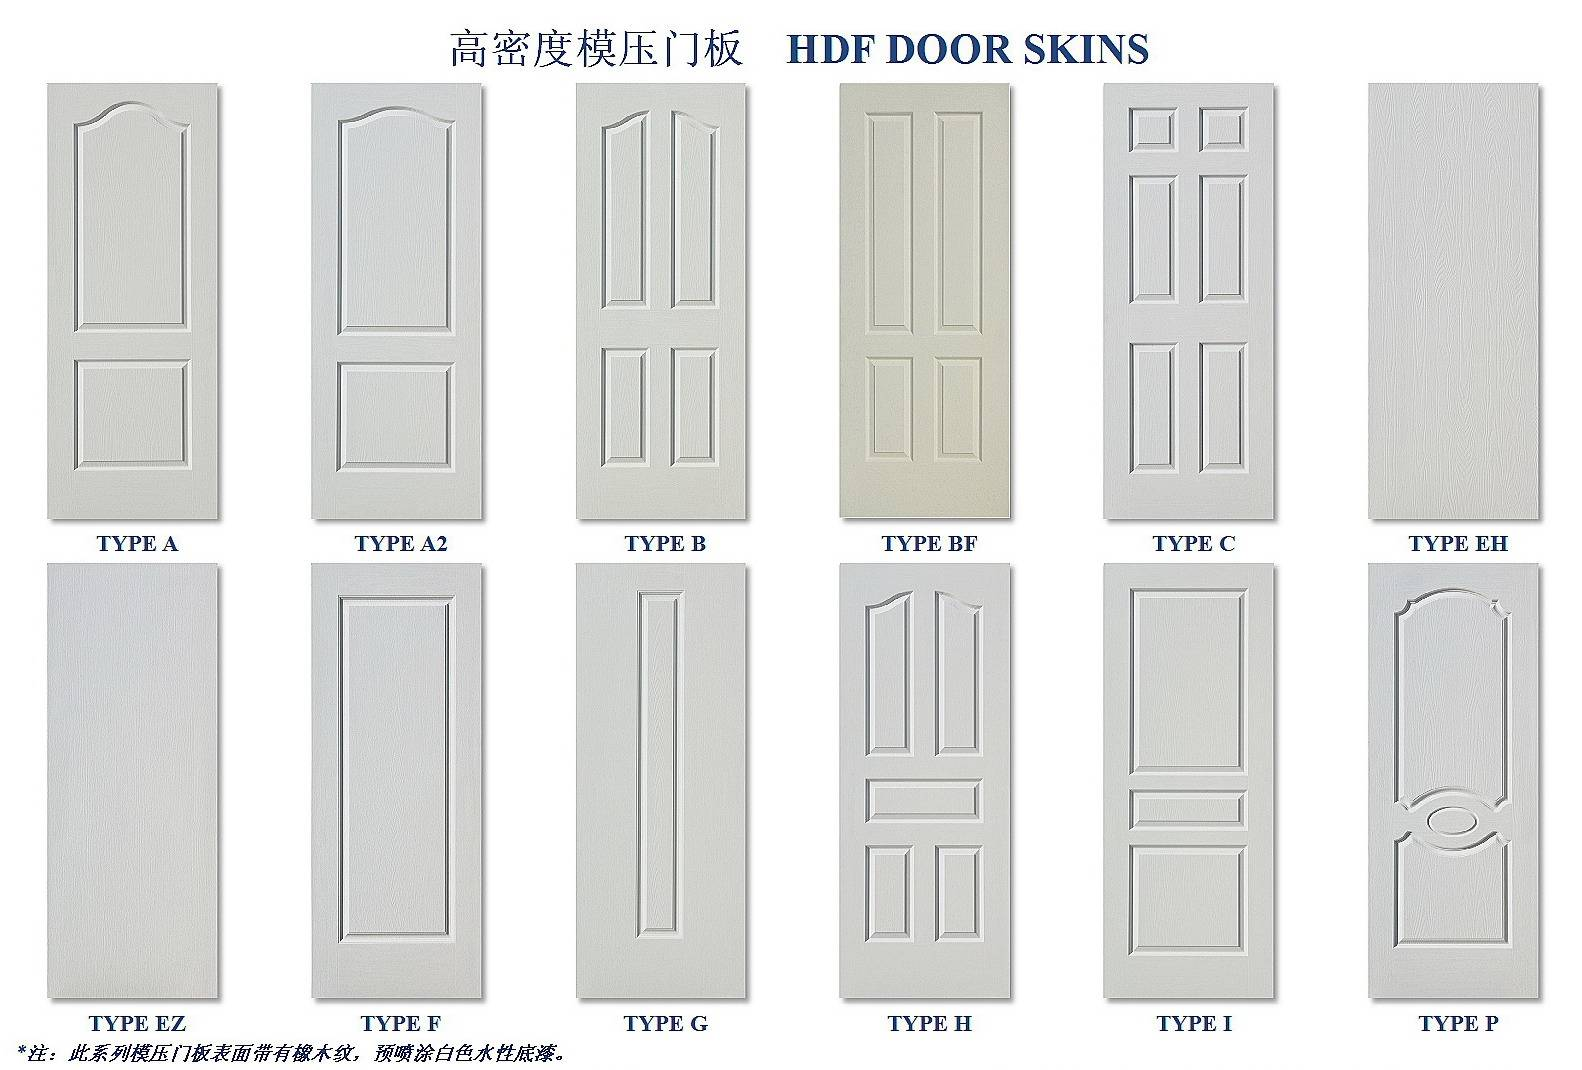 Hdf Moulded Door Skinwhite Primedwood Veneer Xiamen Reshine